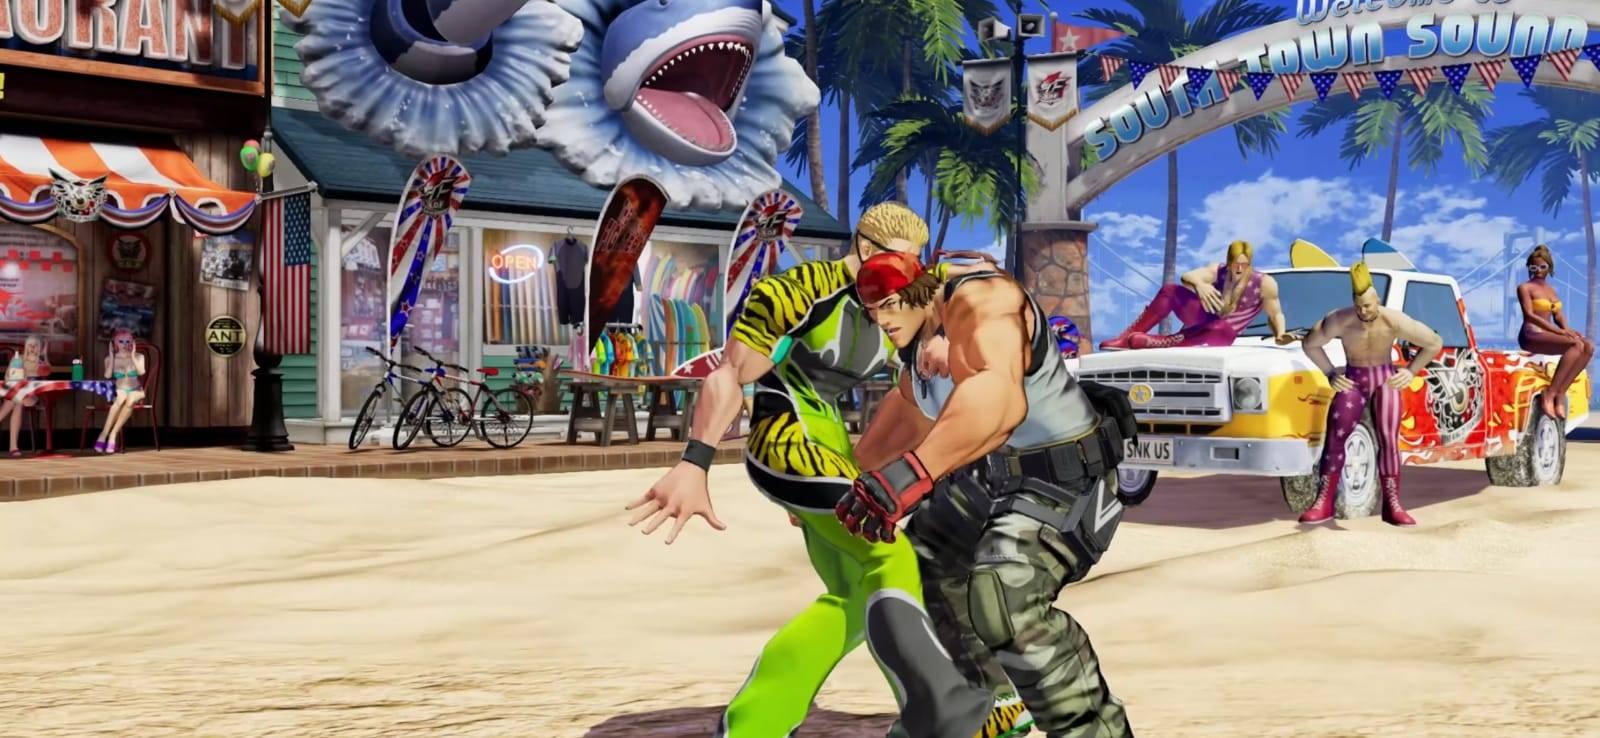 SNK confirma a Ramón como parte de la plantilla de The King of Fighters XV 2